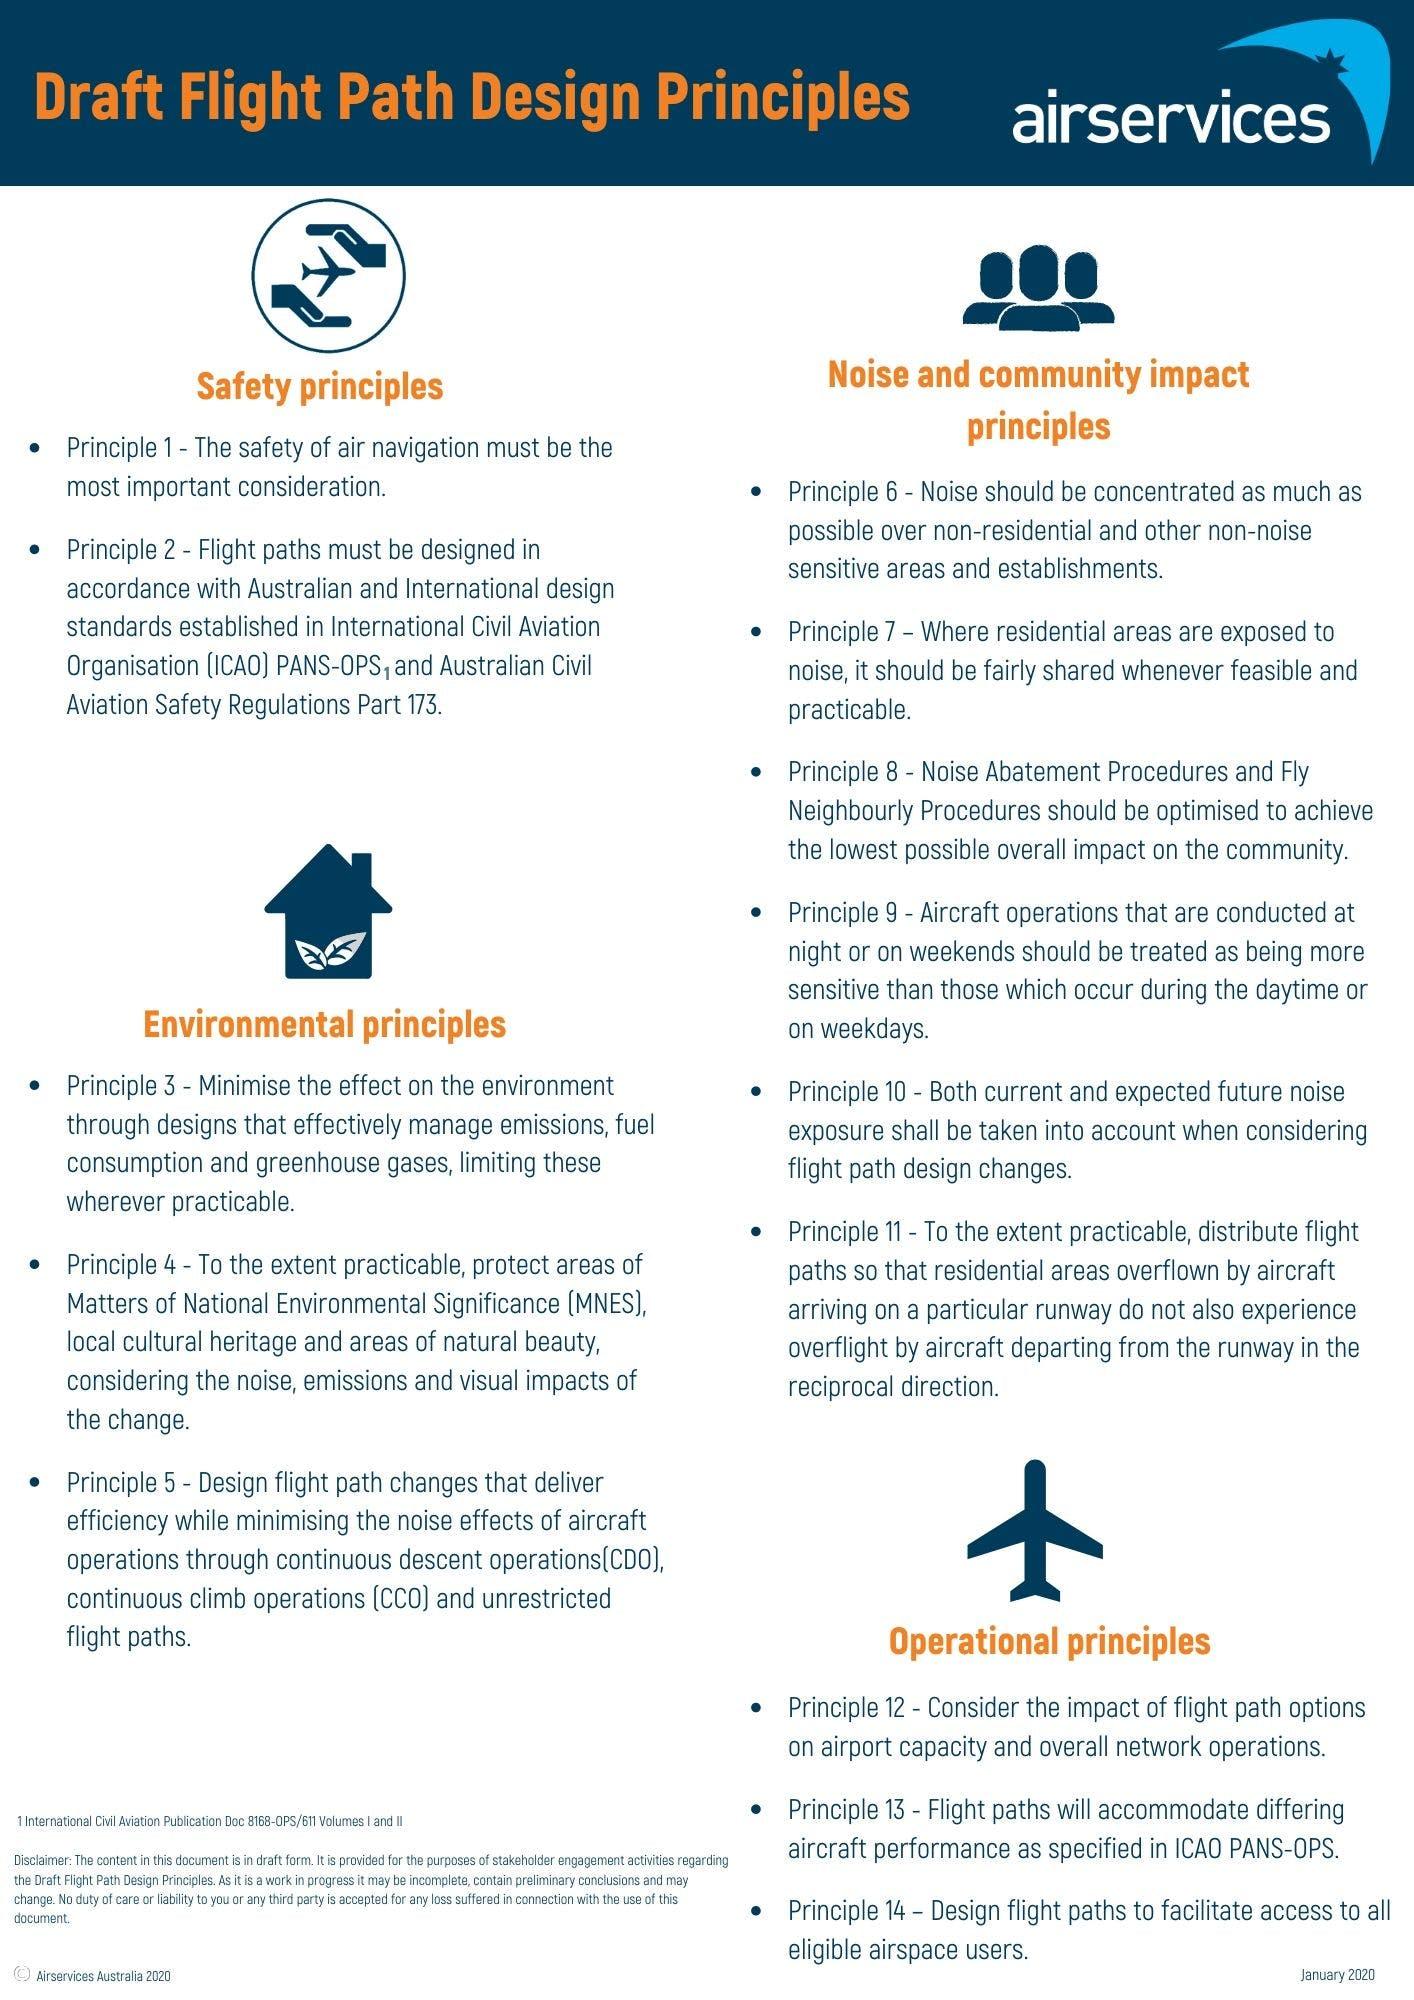 Draft Flight Path Design Principles Fact Sheet (January 2020) page 2